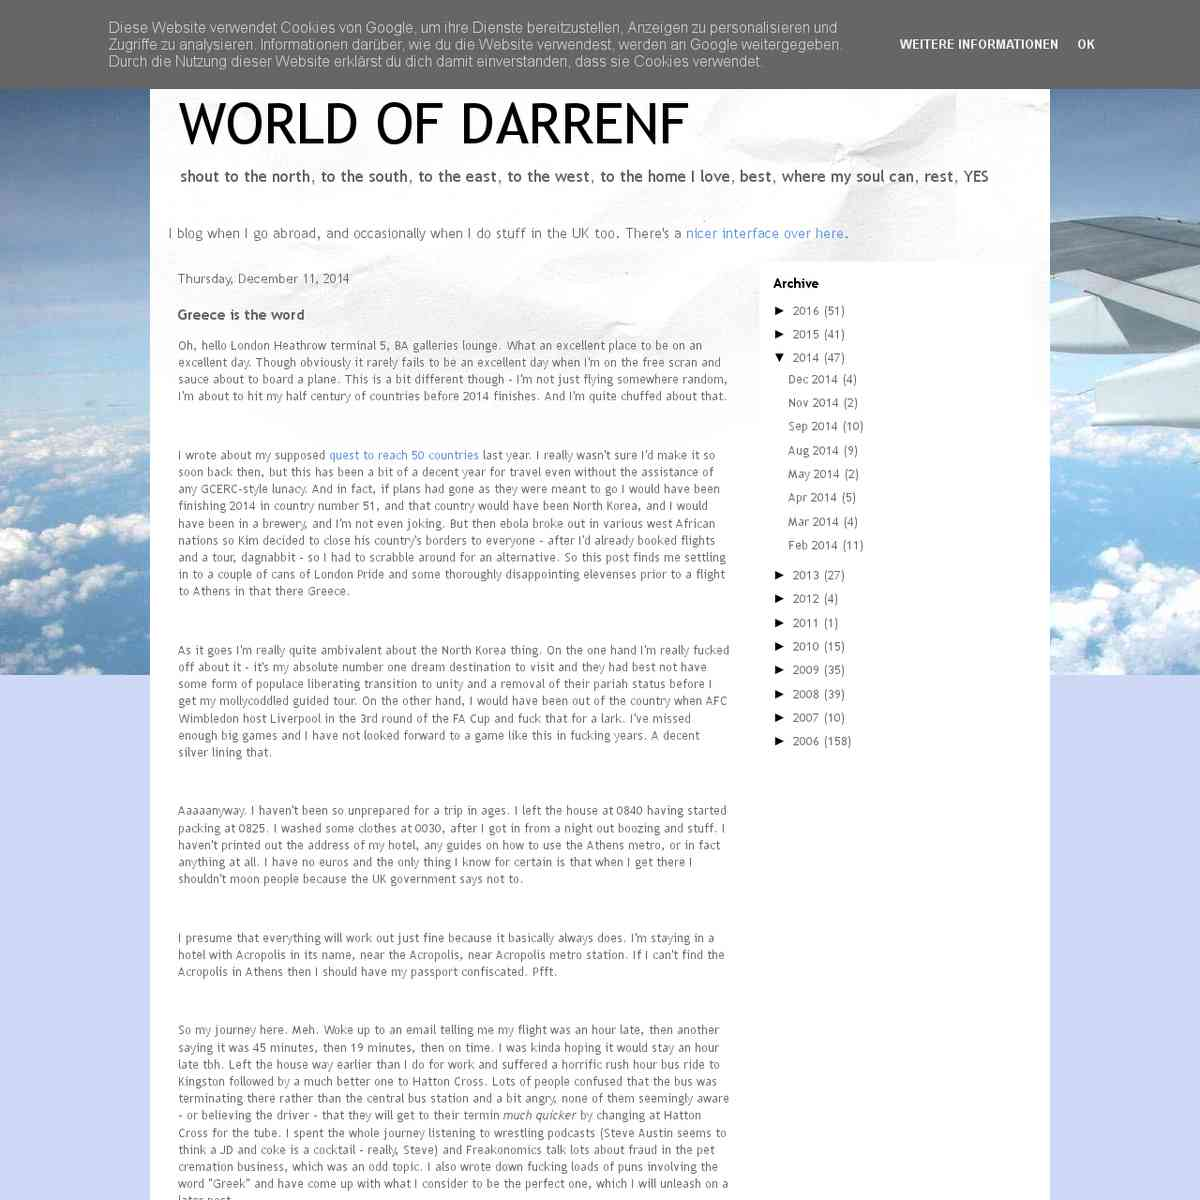 blog.darrenf.org/2014/12/greece-is-word.html